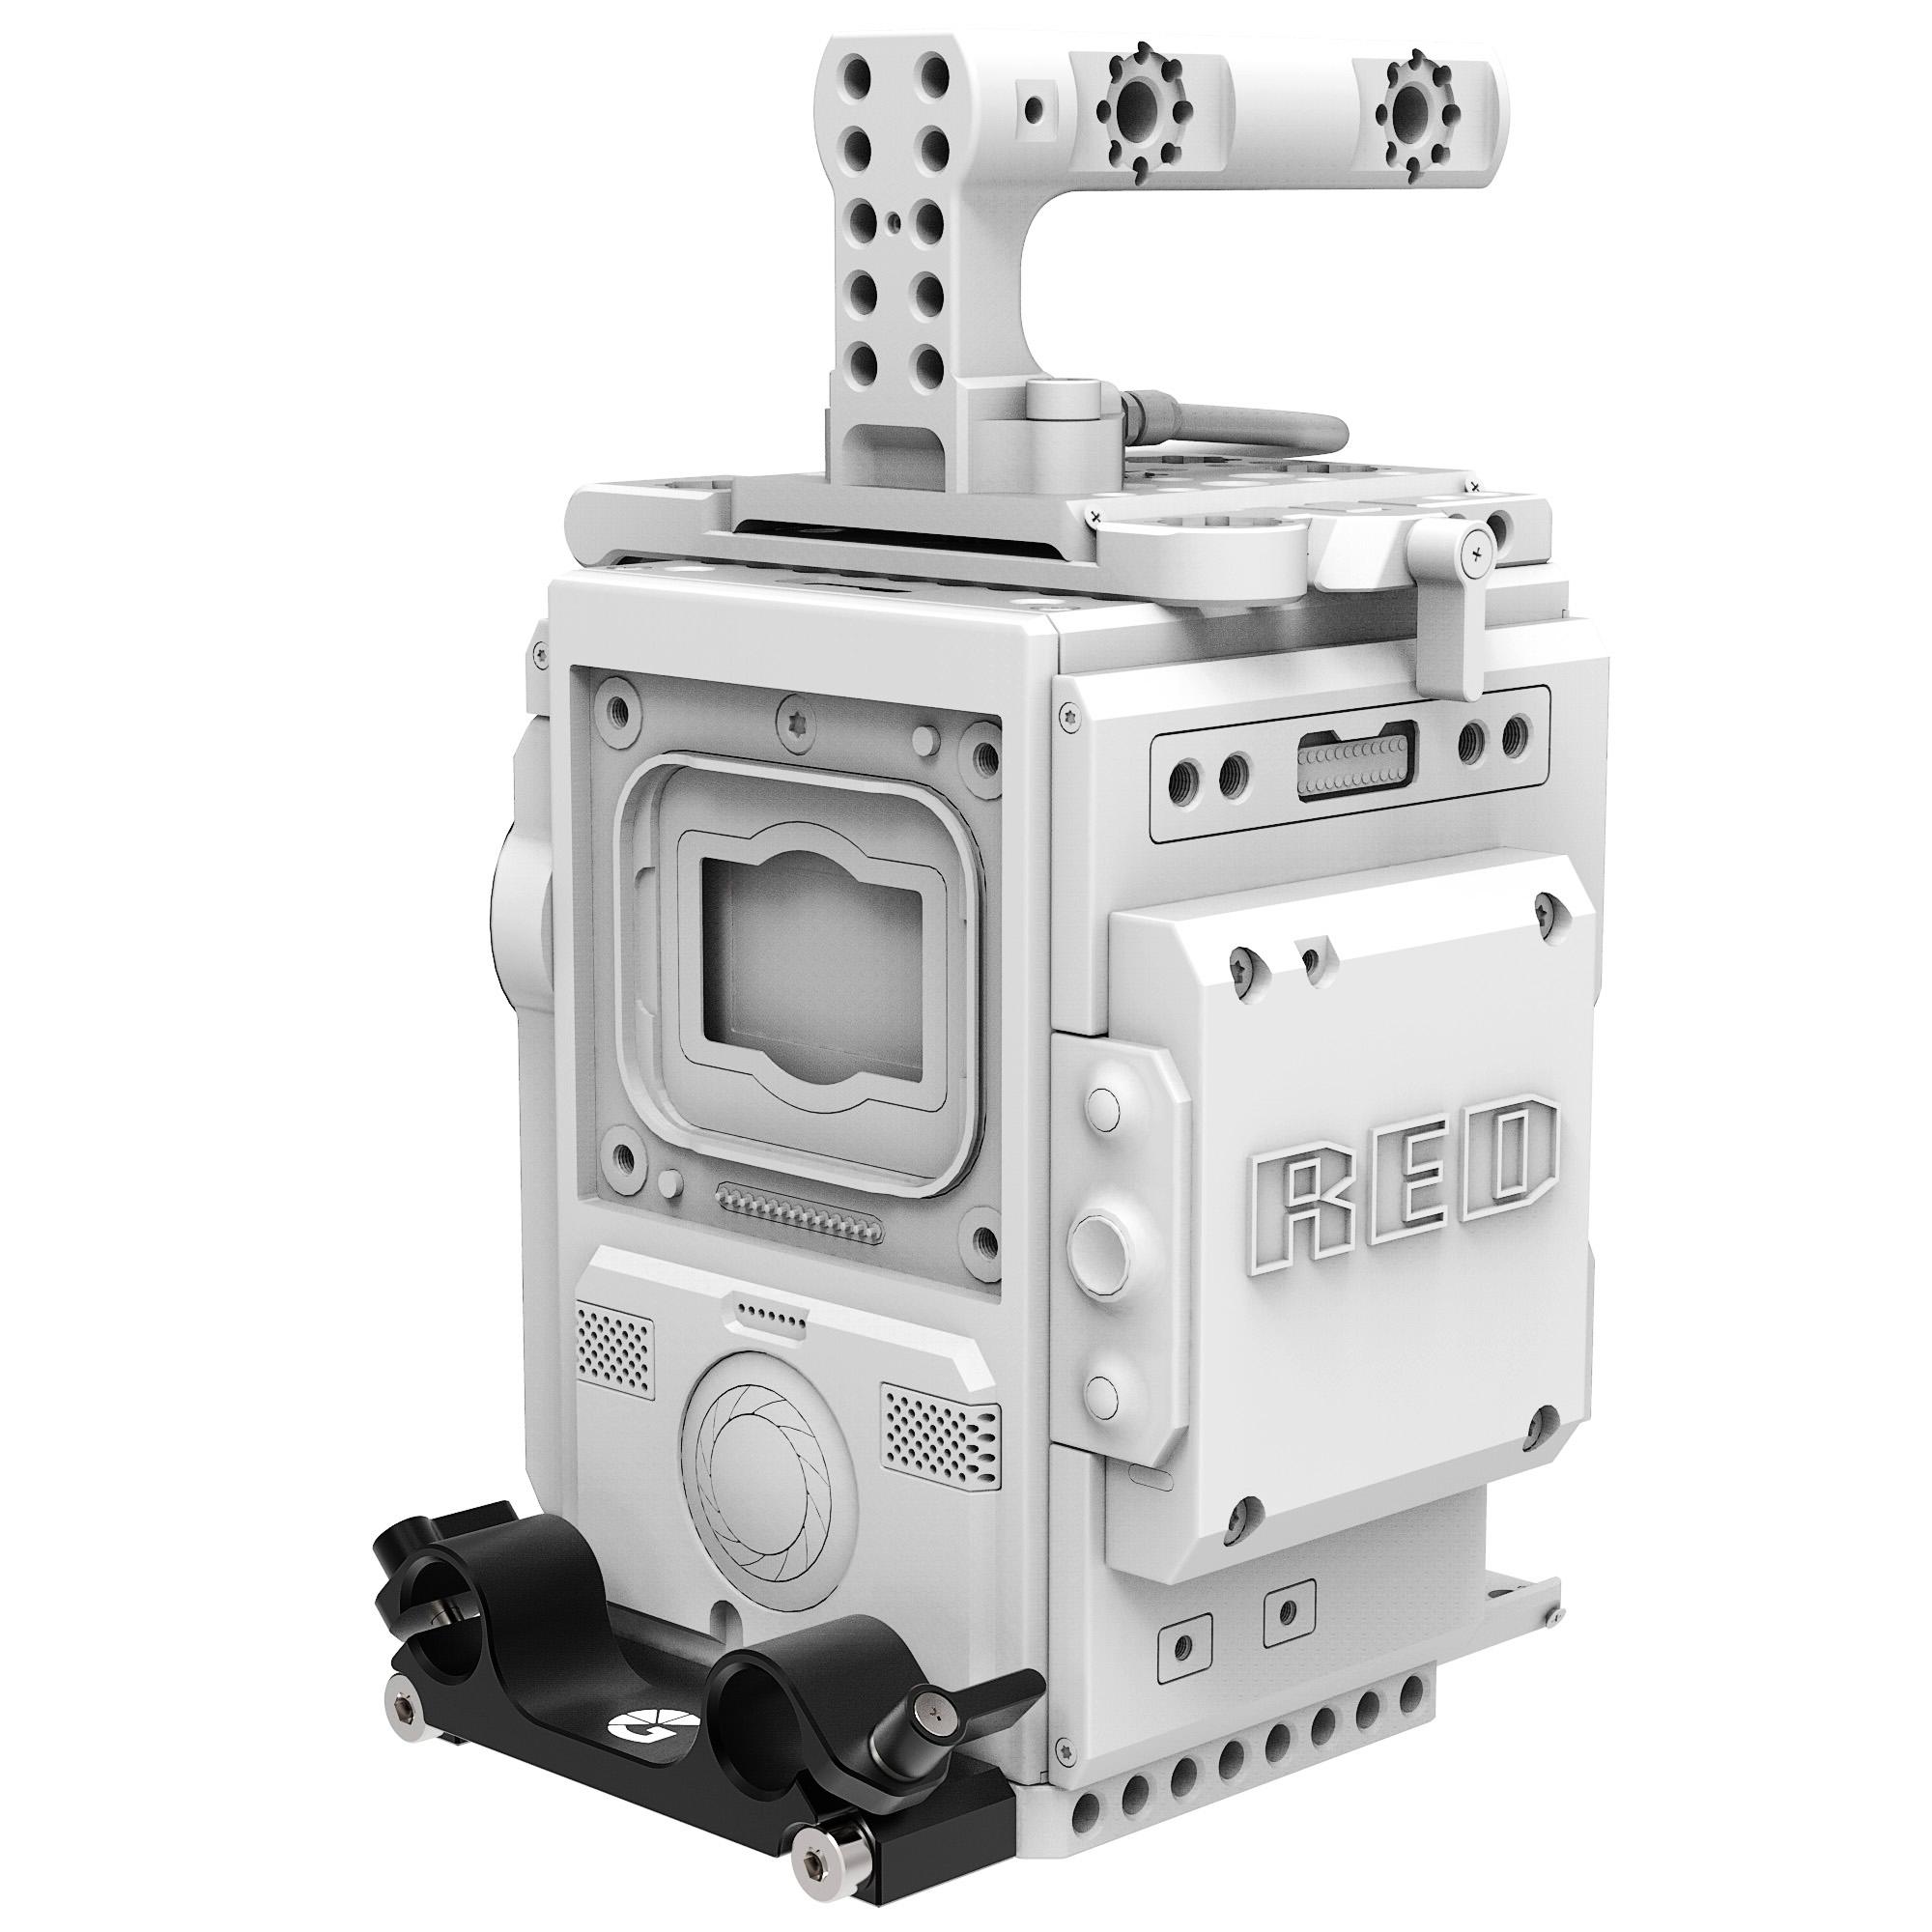 B4002 1003 15mm LWS mount for DSMC2 5